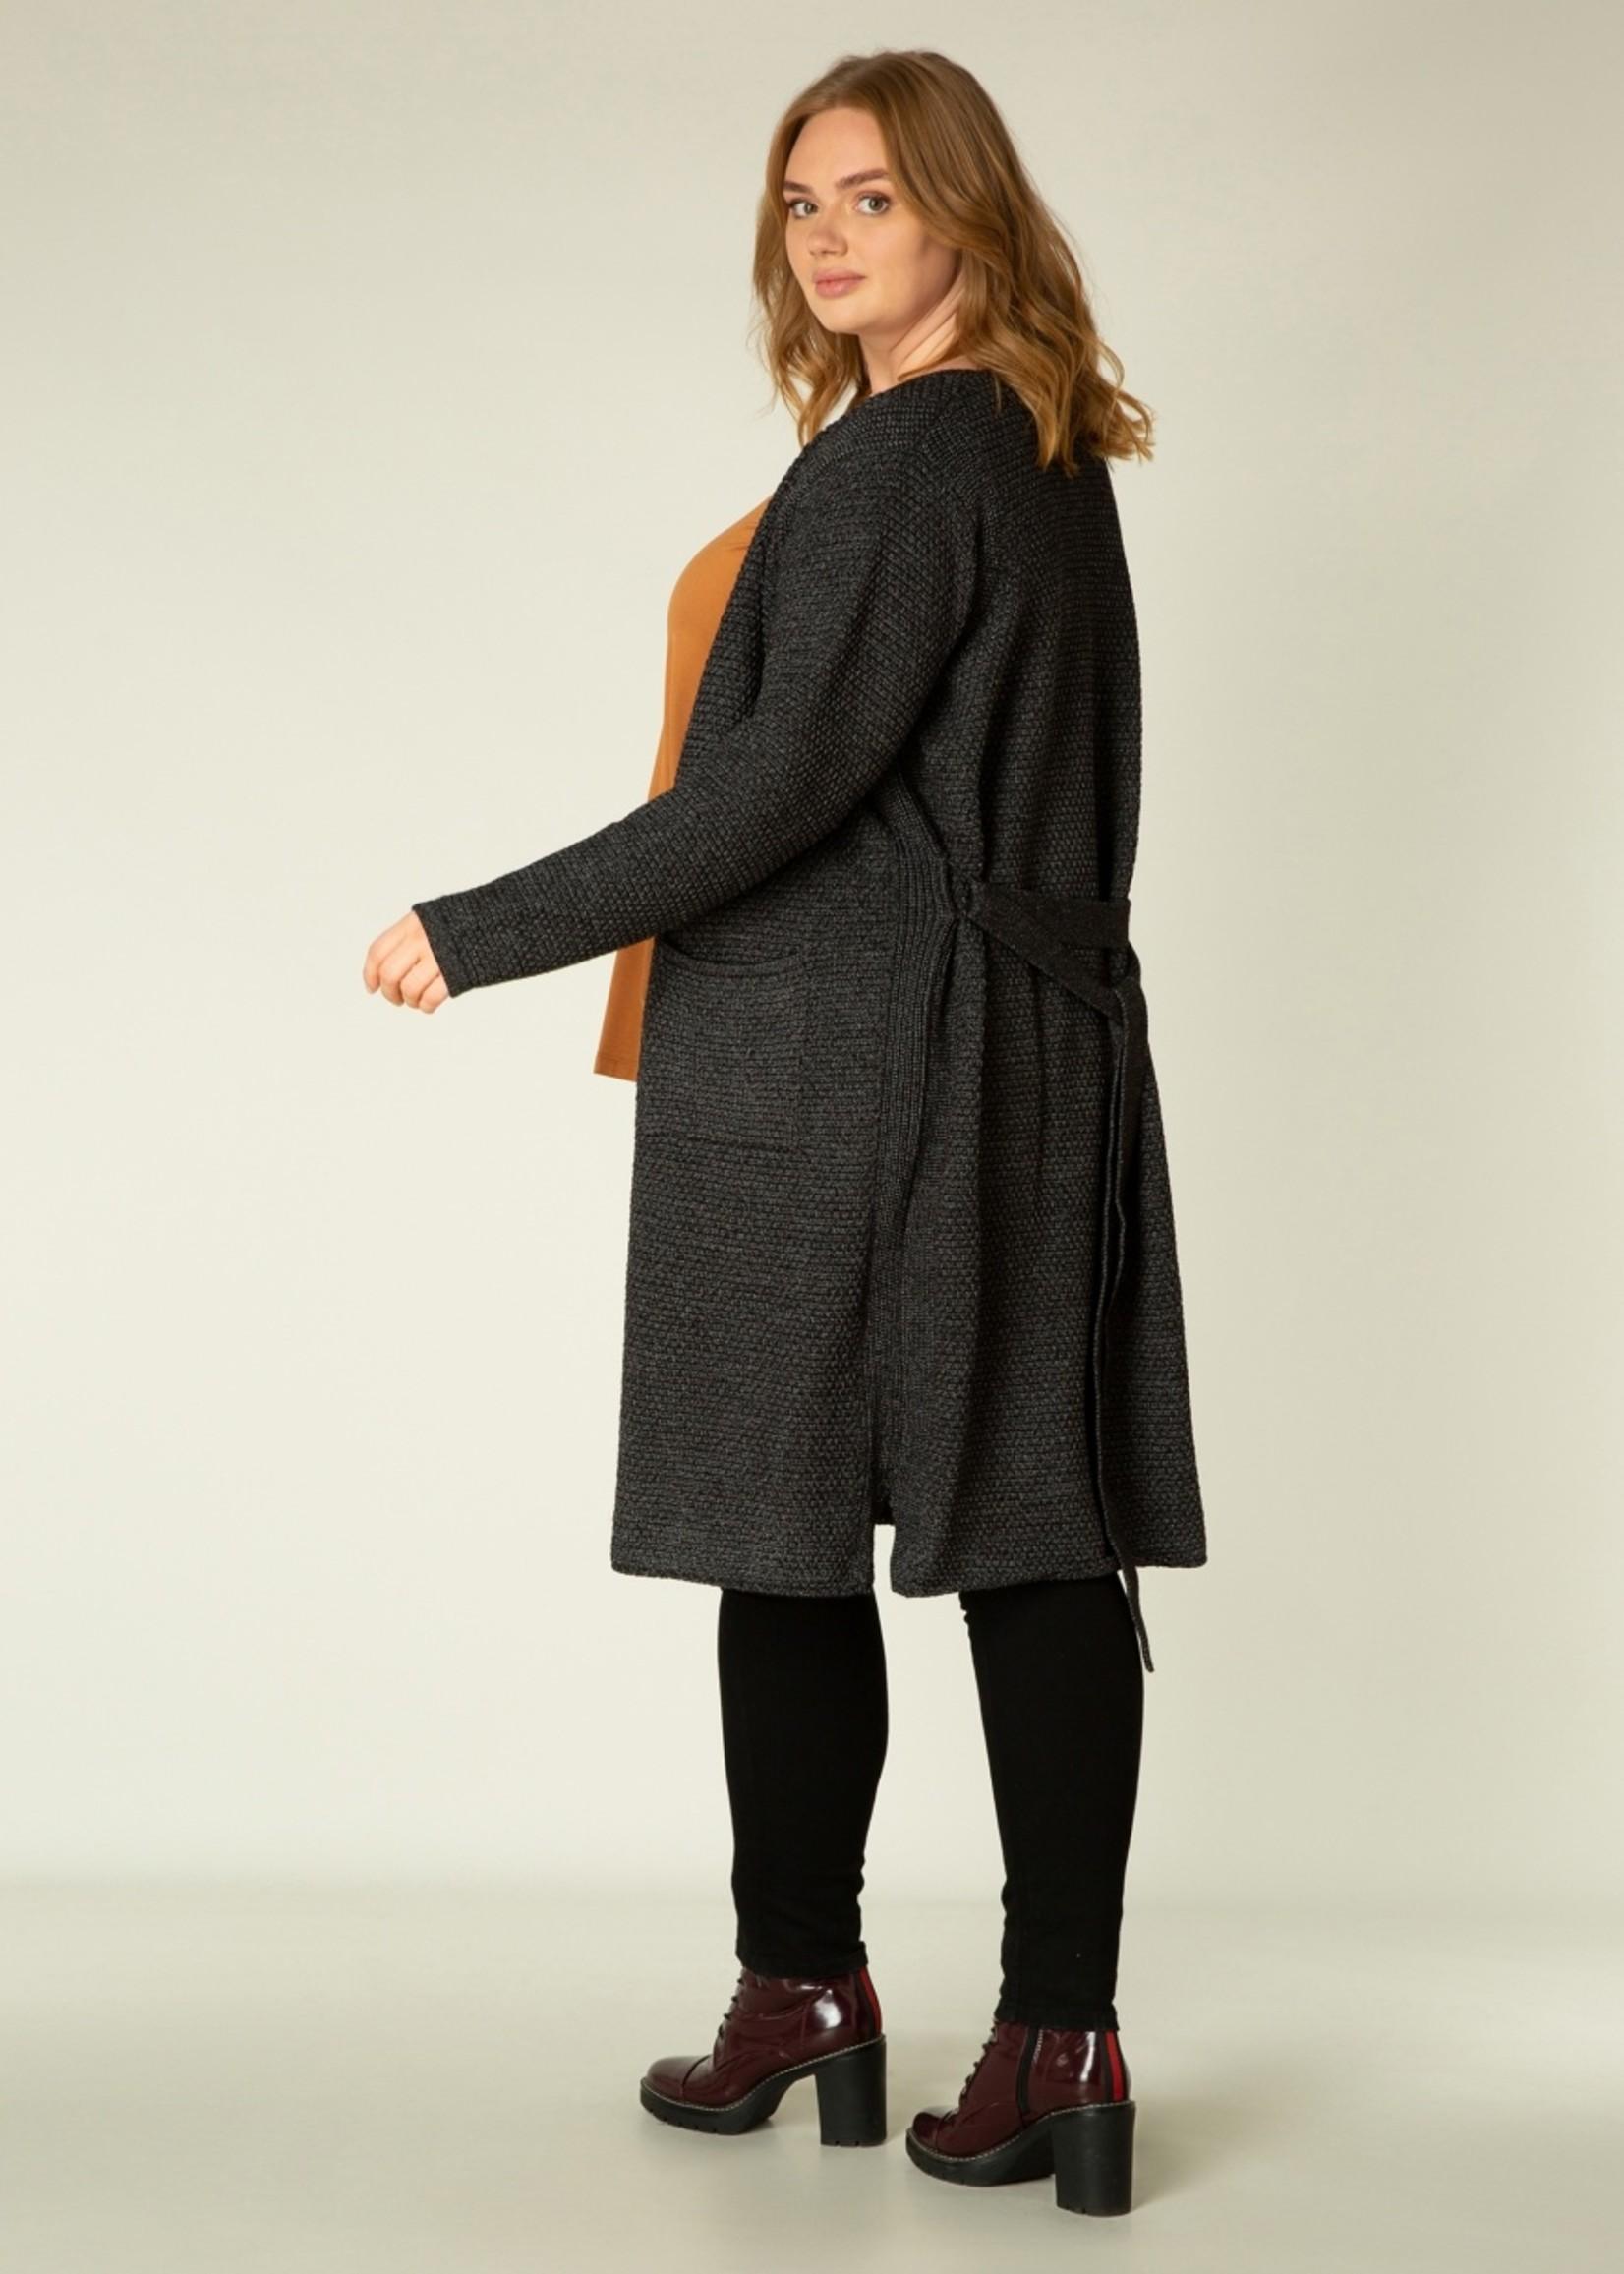 Yesta A002027 Vest Veith